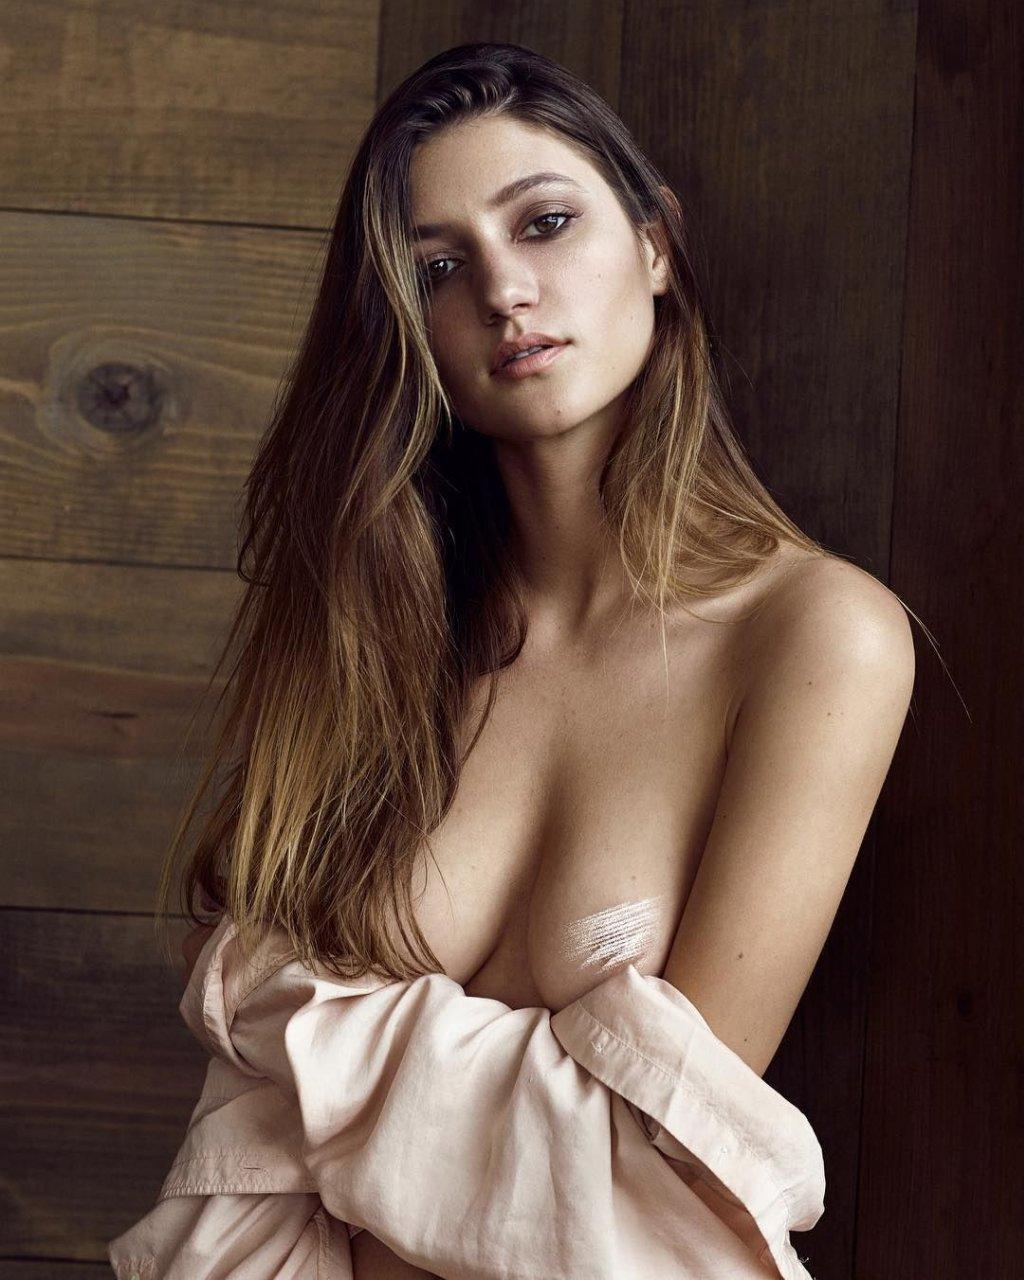 Khloe Terae Fappening Nude And Sexy - 59 Photos Sex photo Saskia leppin blauer ball 2019 in hamburg,Selena Gomez Sexy